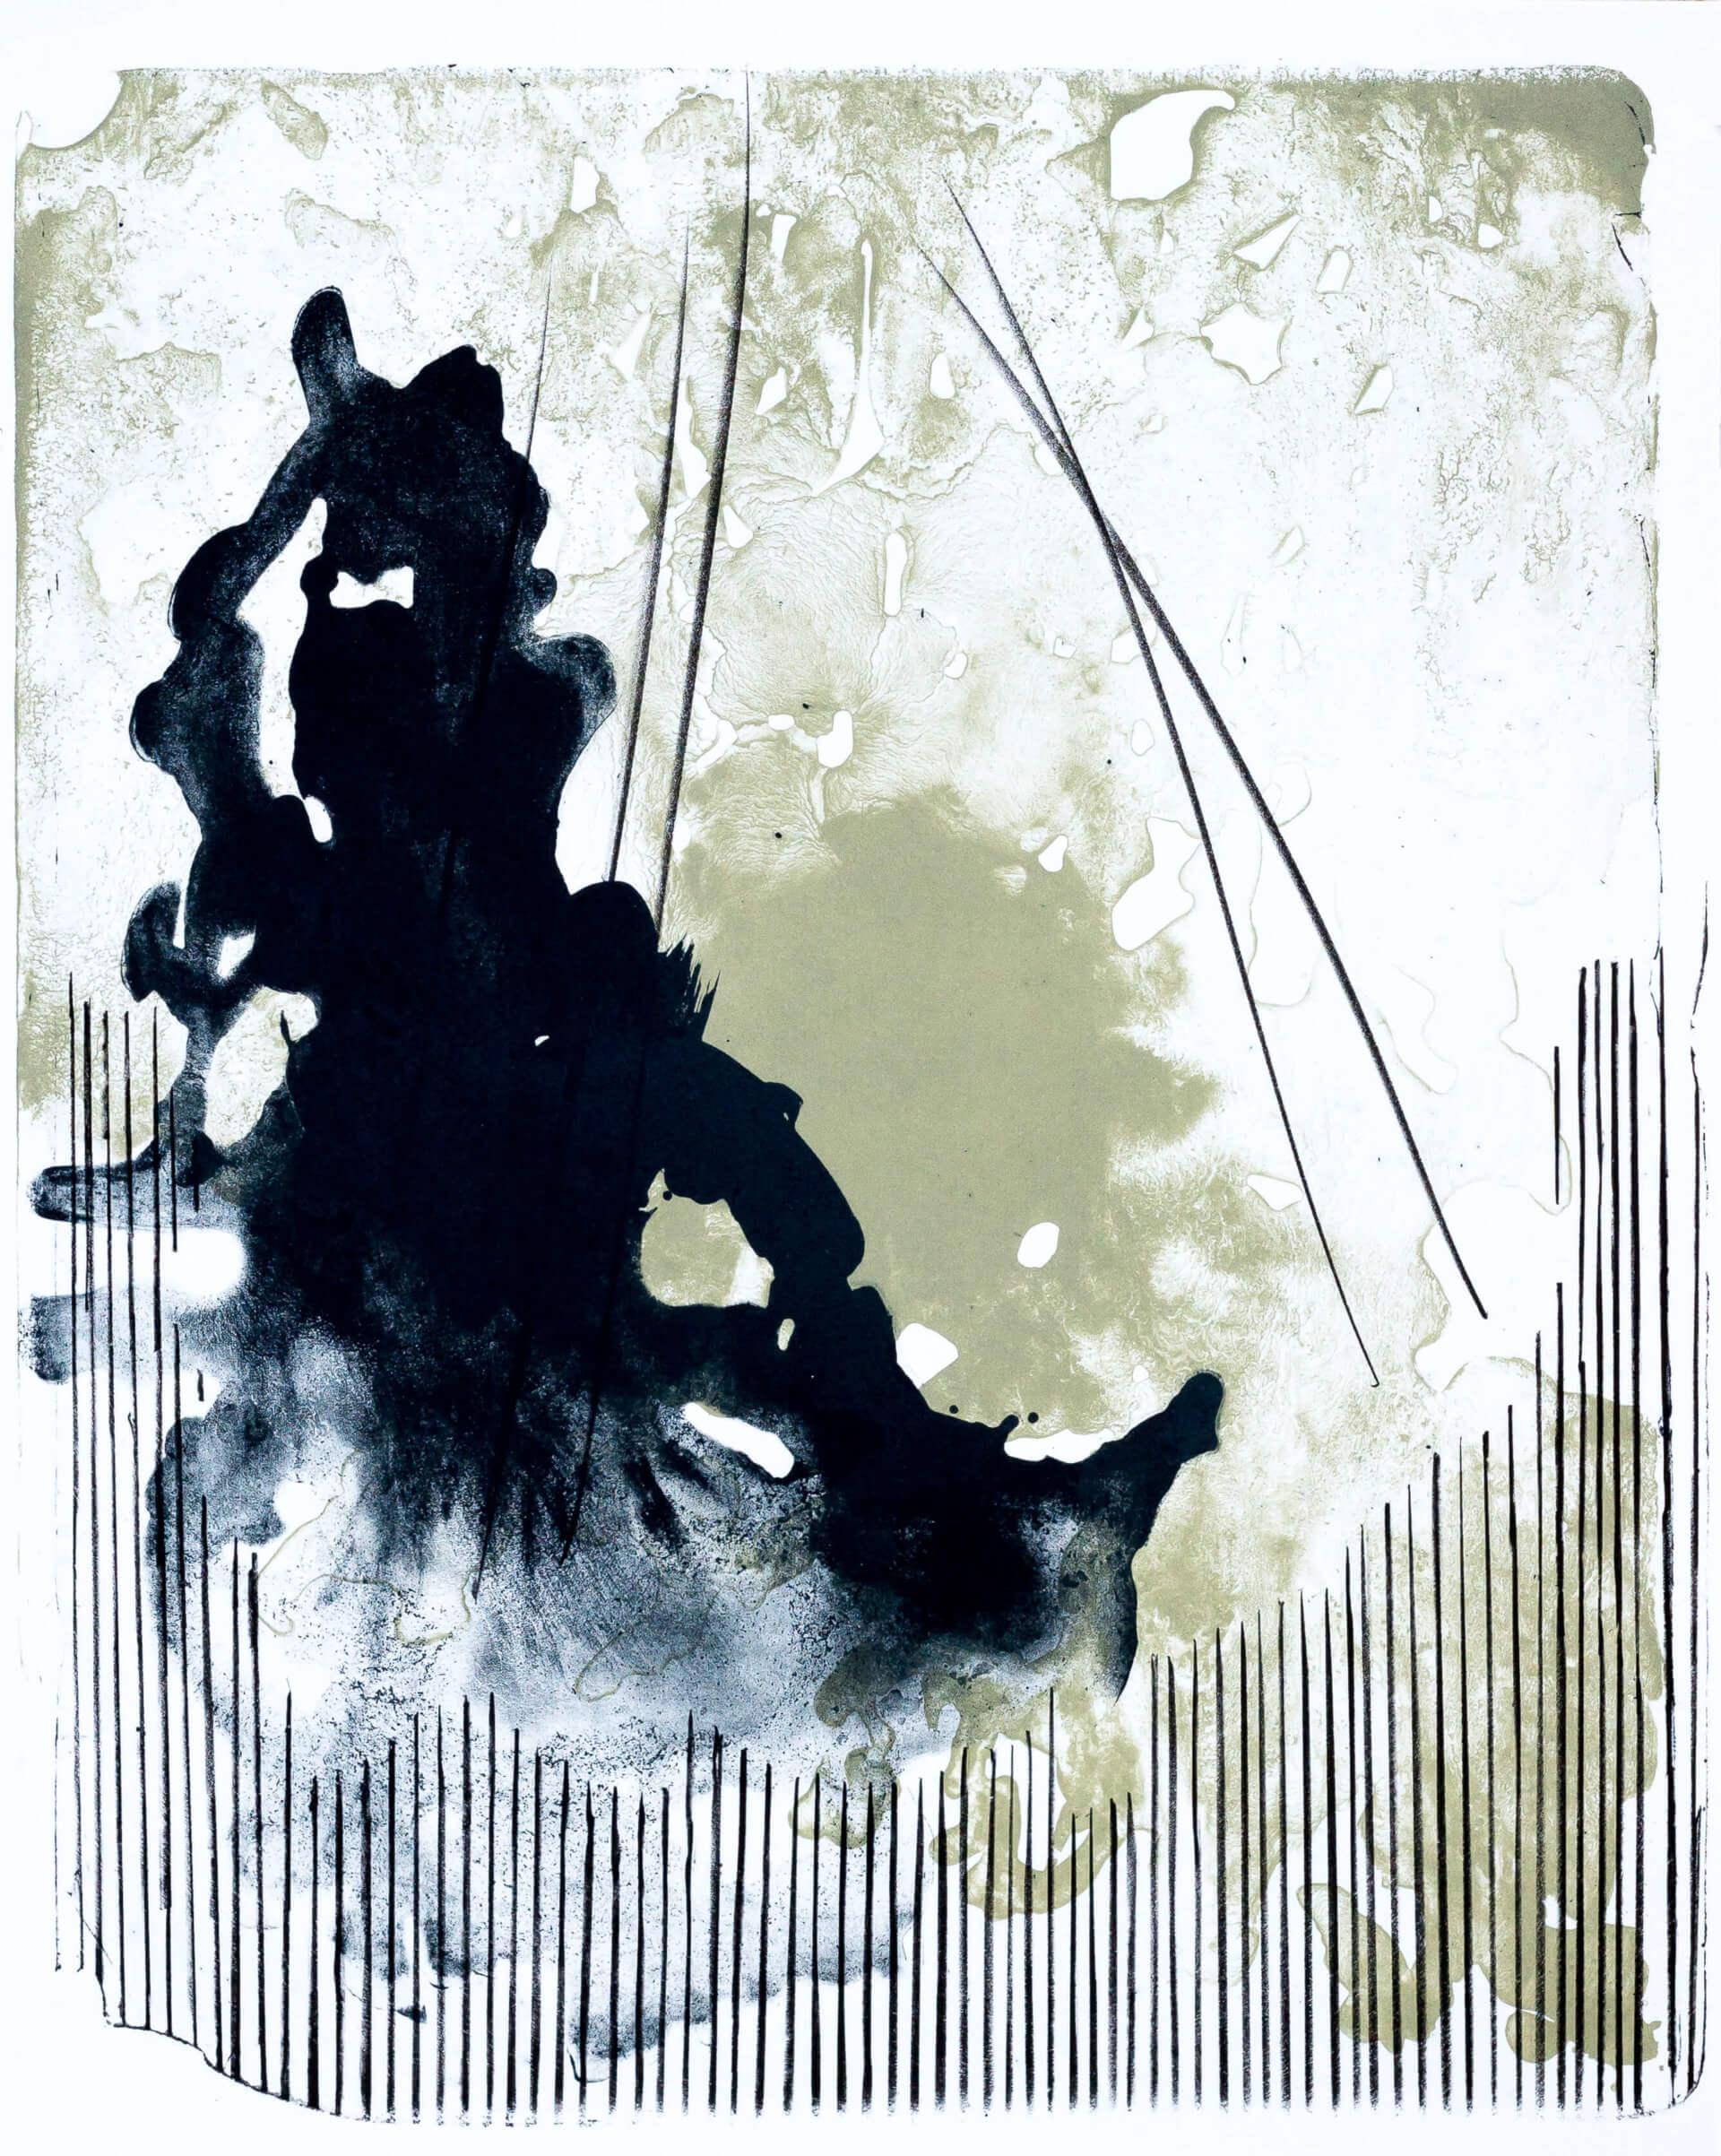 Katharina Albers, organism (Wald) VIII, 2016, Farblithographie, Unikat, 50x40 cm